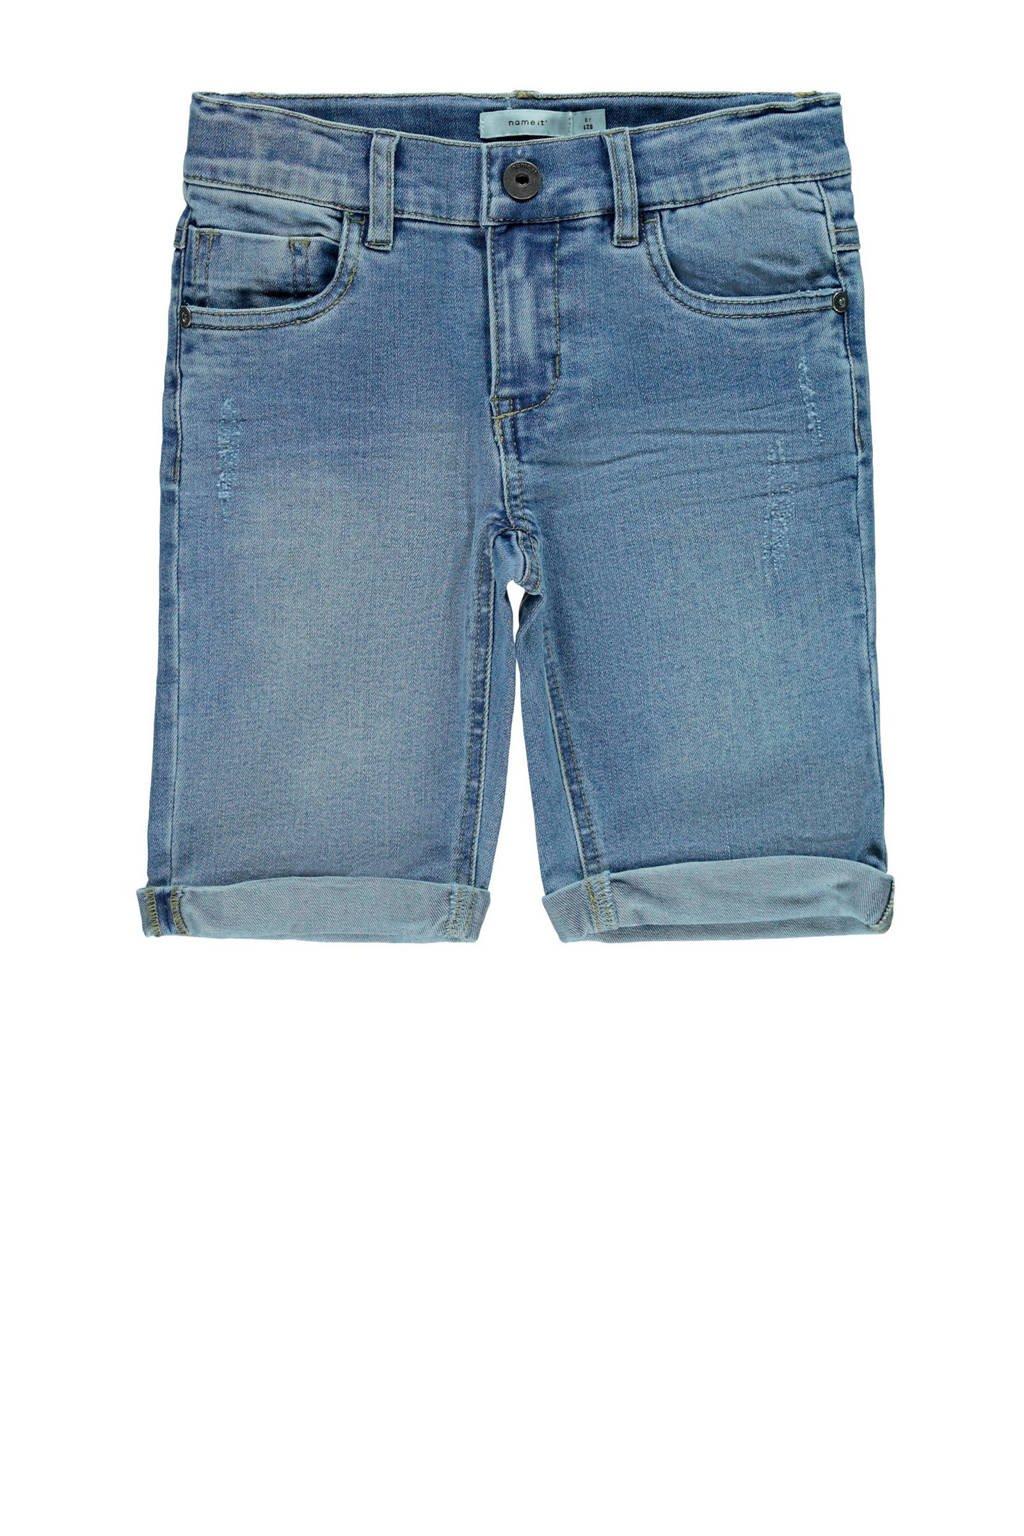 NAME IT KIDS slim fit jeans bermuda Sofus light blue denim, Light blue denim